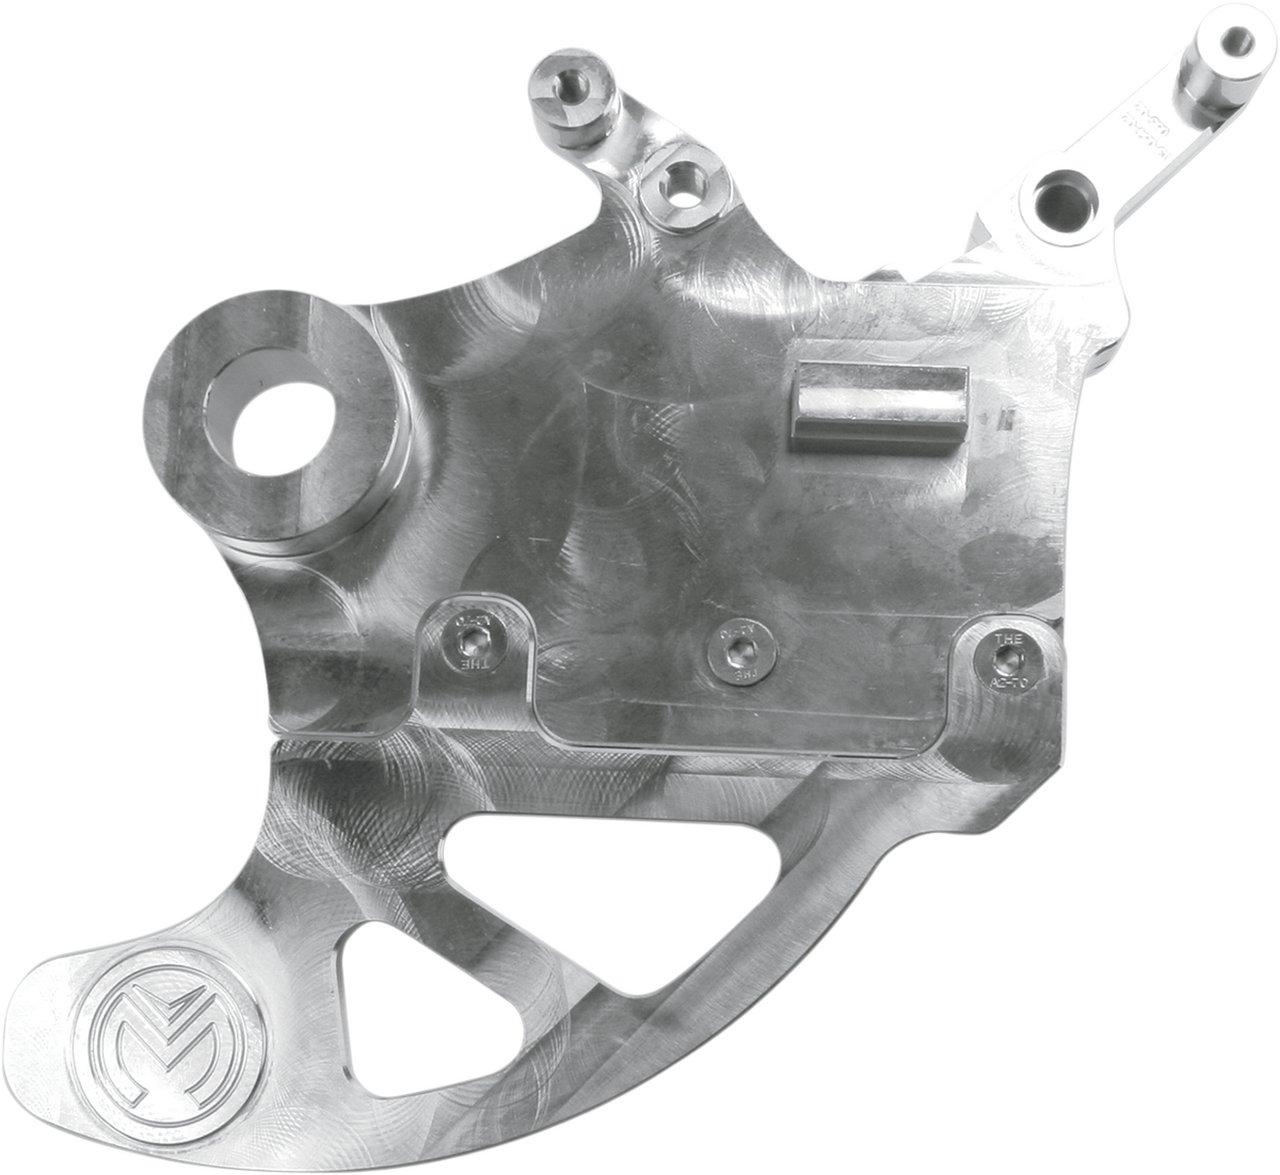 【MOOSE RACING】PRO 剎車碟盤護蓋組 [1711-0230] - 「Webike-摩托百貨」